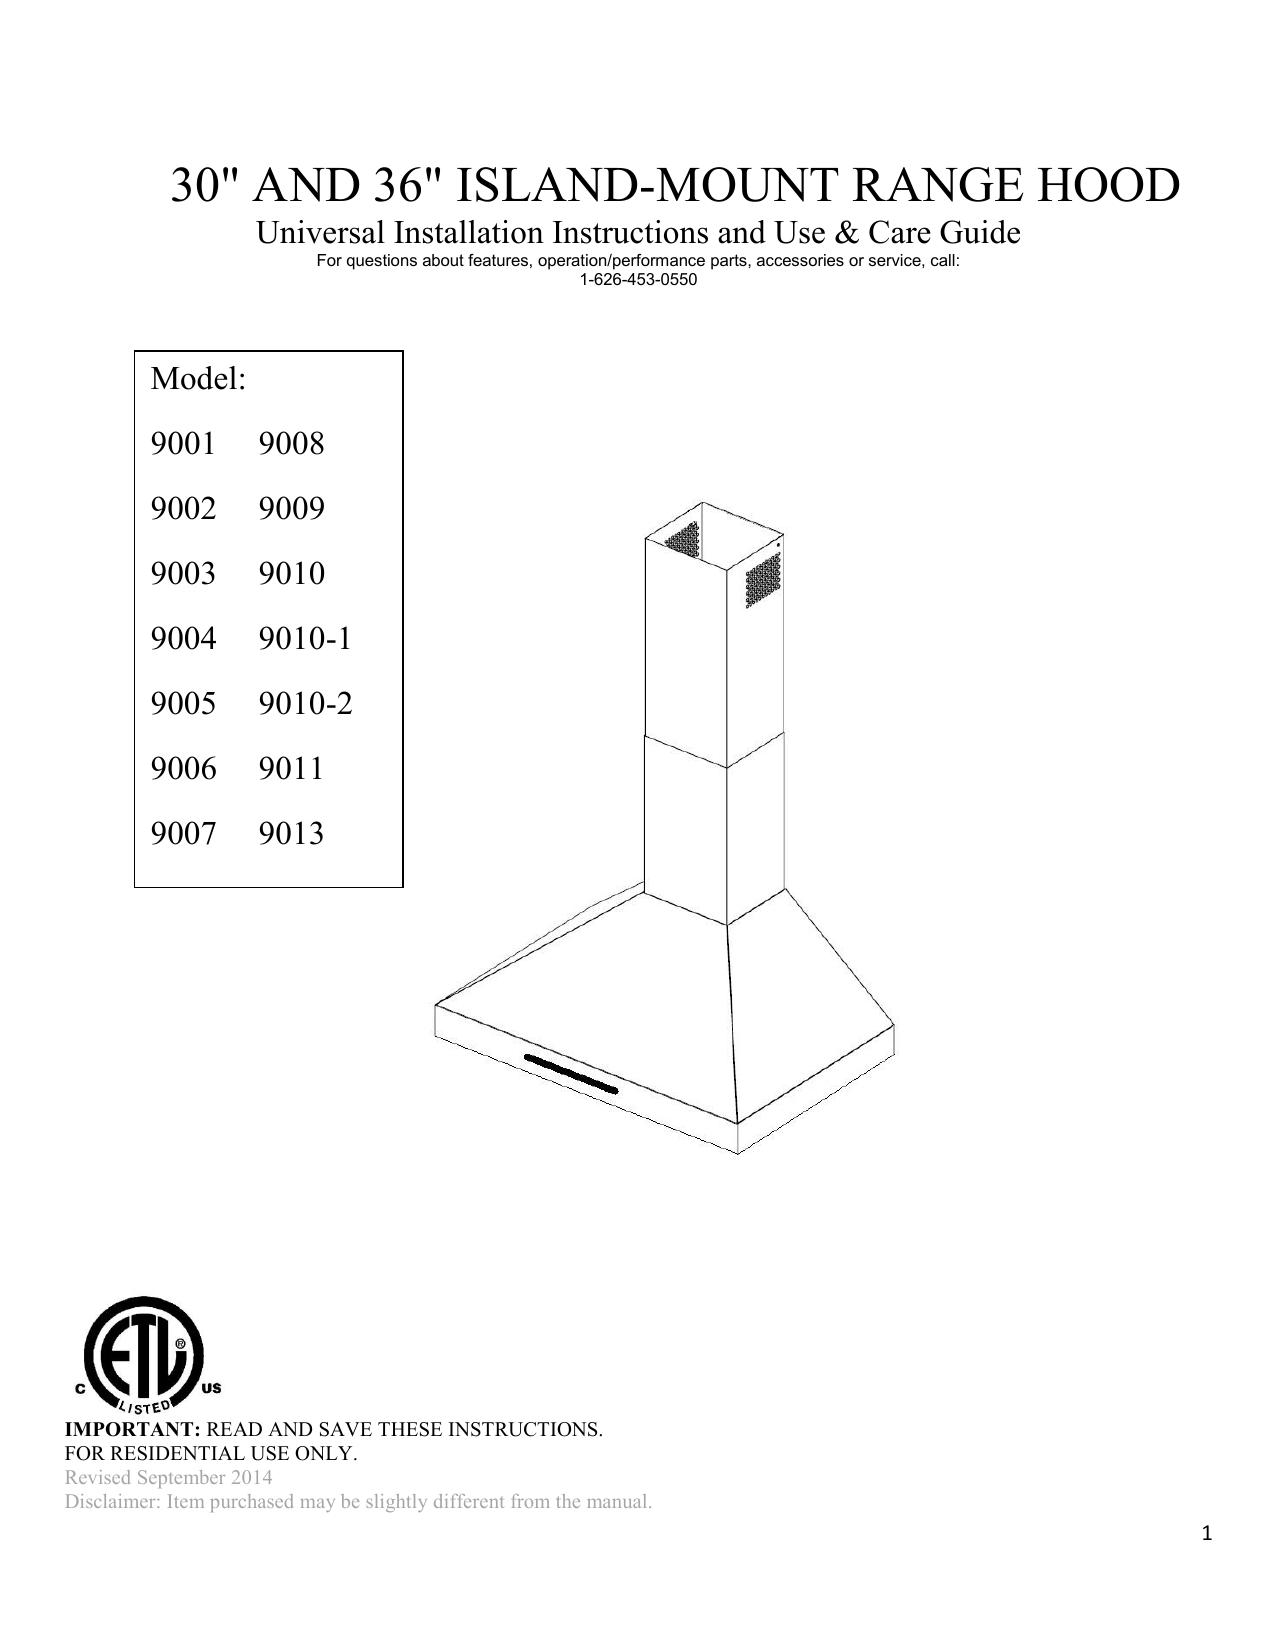 Golden Vantage Gv900536p Gv900236 Gv900936 Ak901336 Gv900530p Gv900930 Gv900230 Installation Guide Manualzz